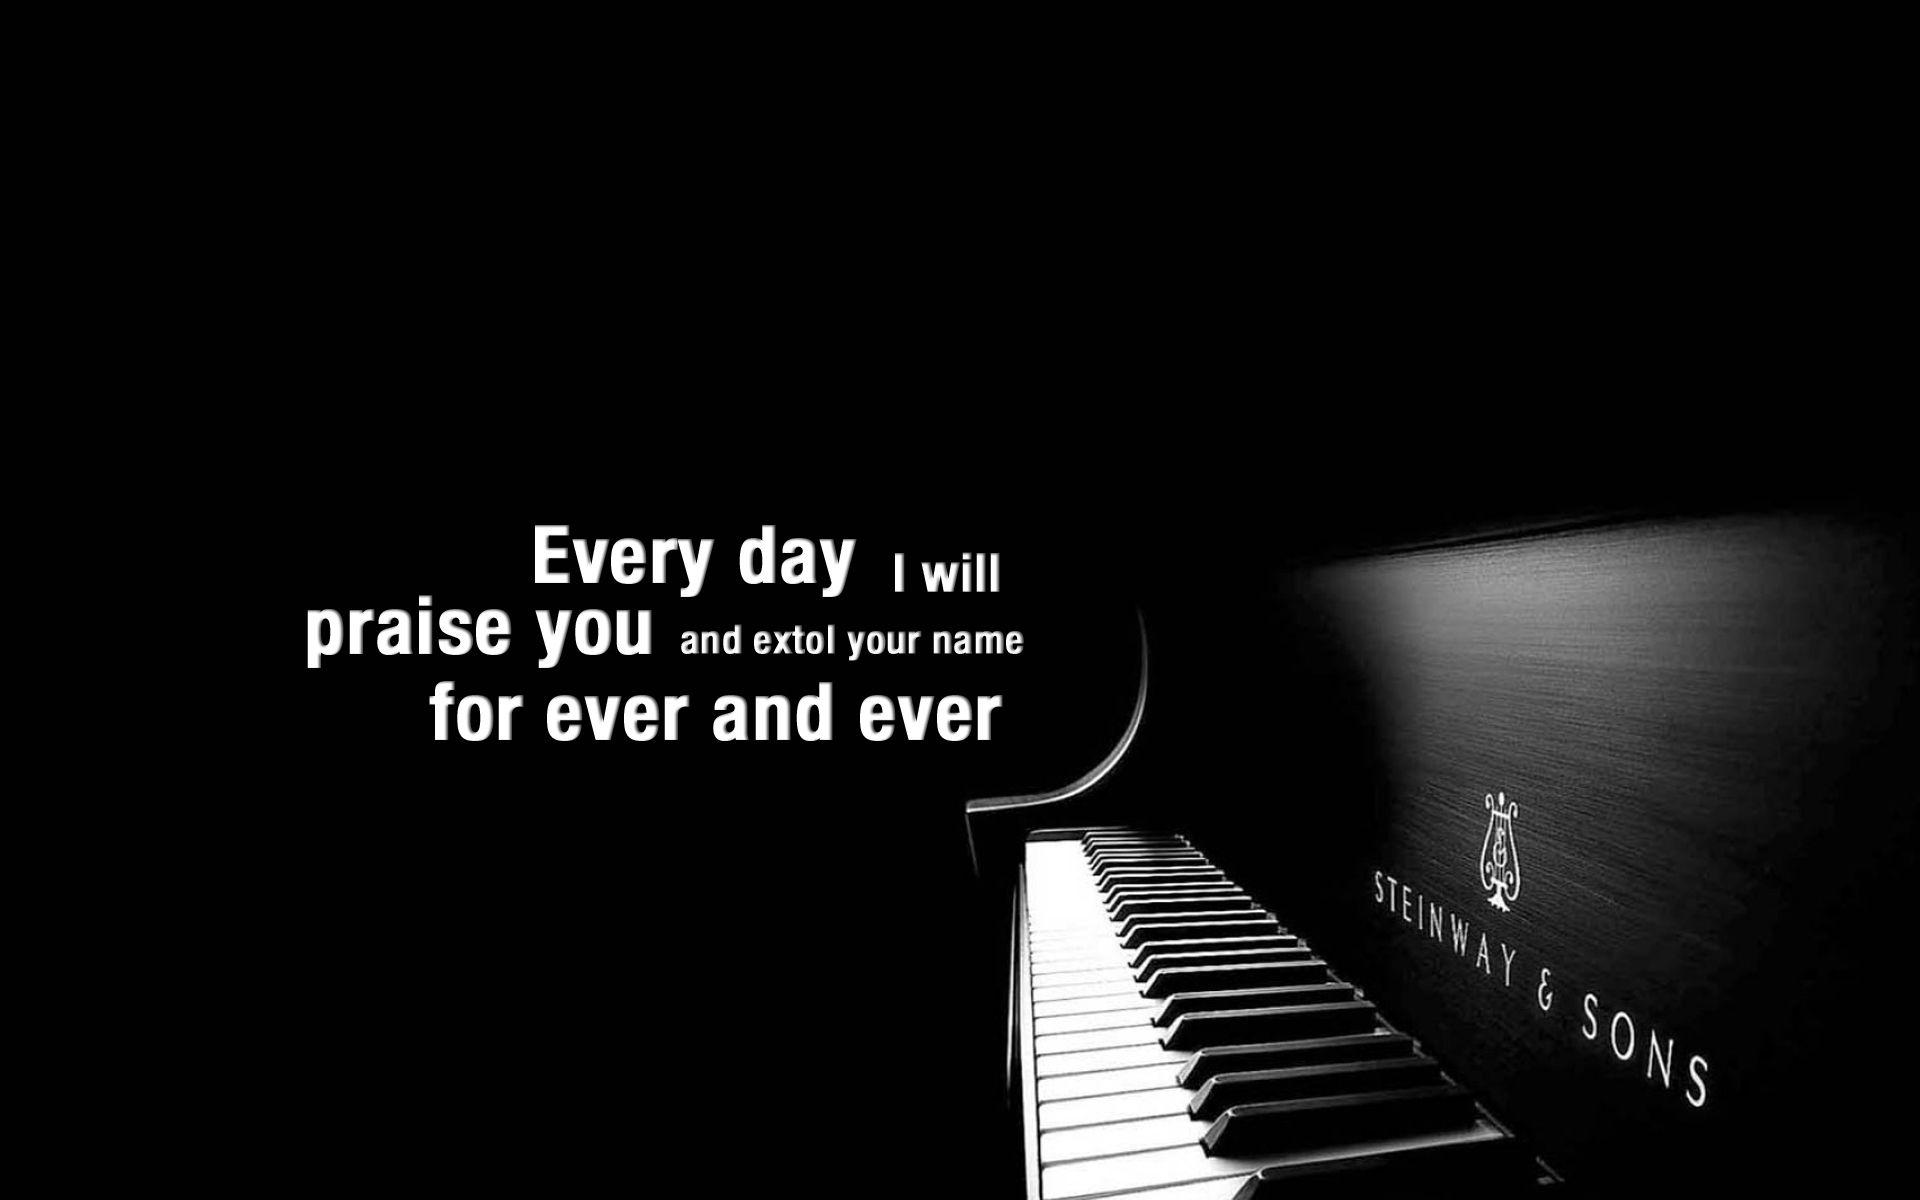 Christian Music Wallpaper Hd Google Search Music Christian